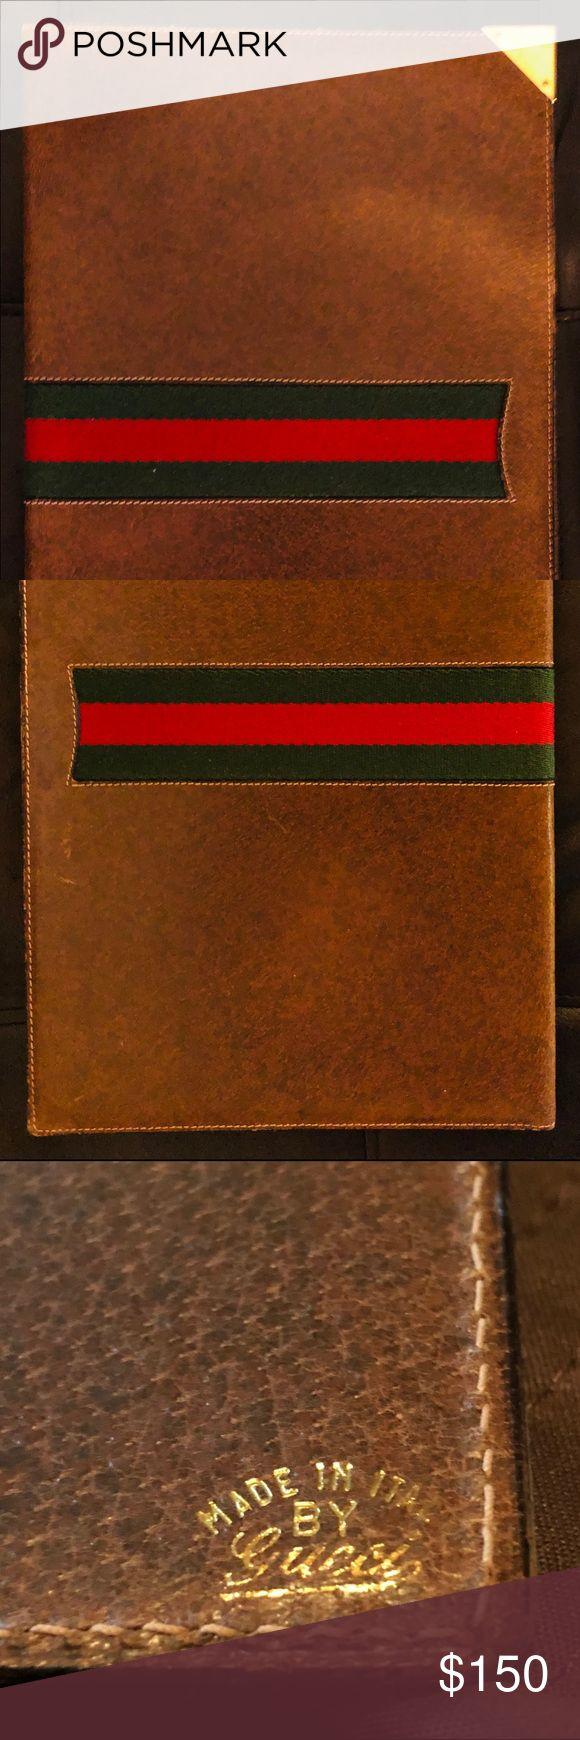 vintage gucci leather resume organizer portfolio vintage